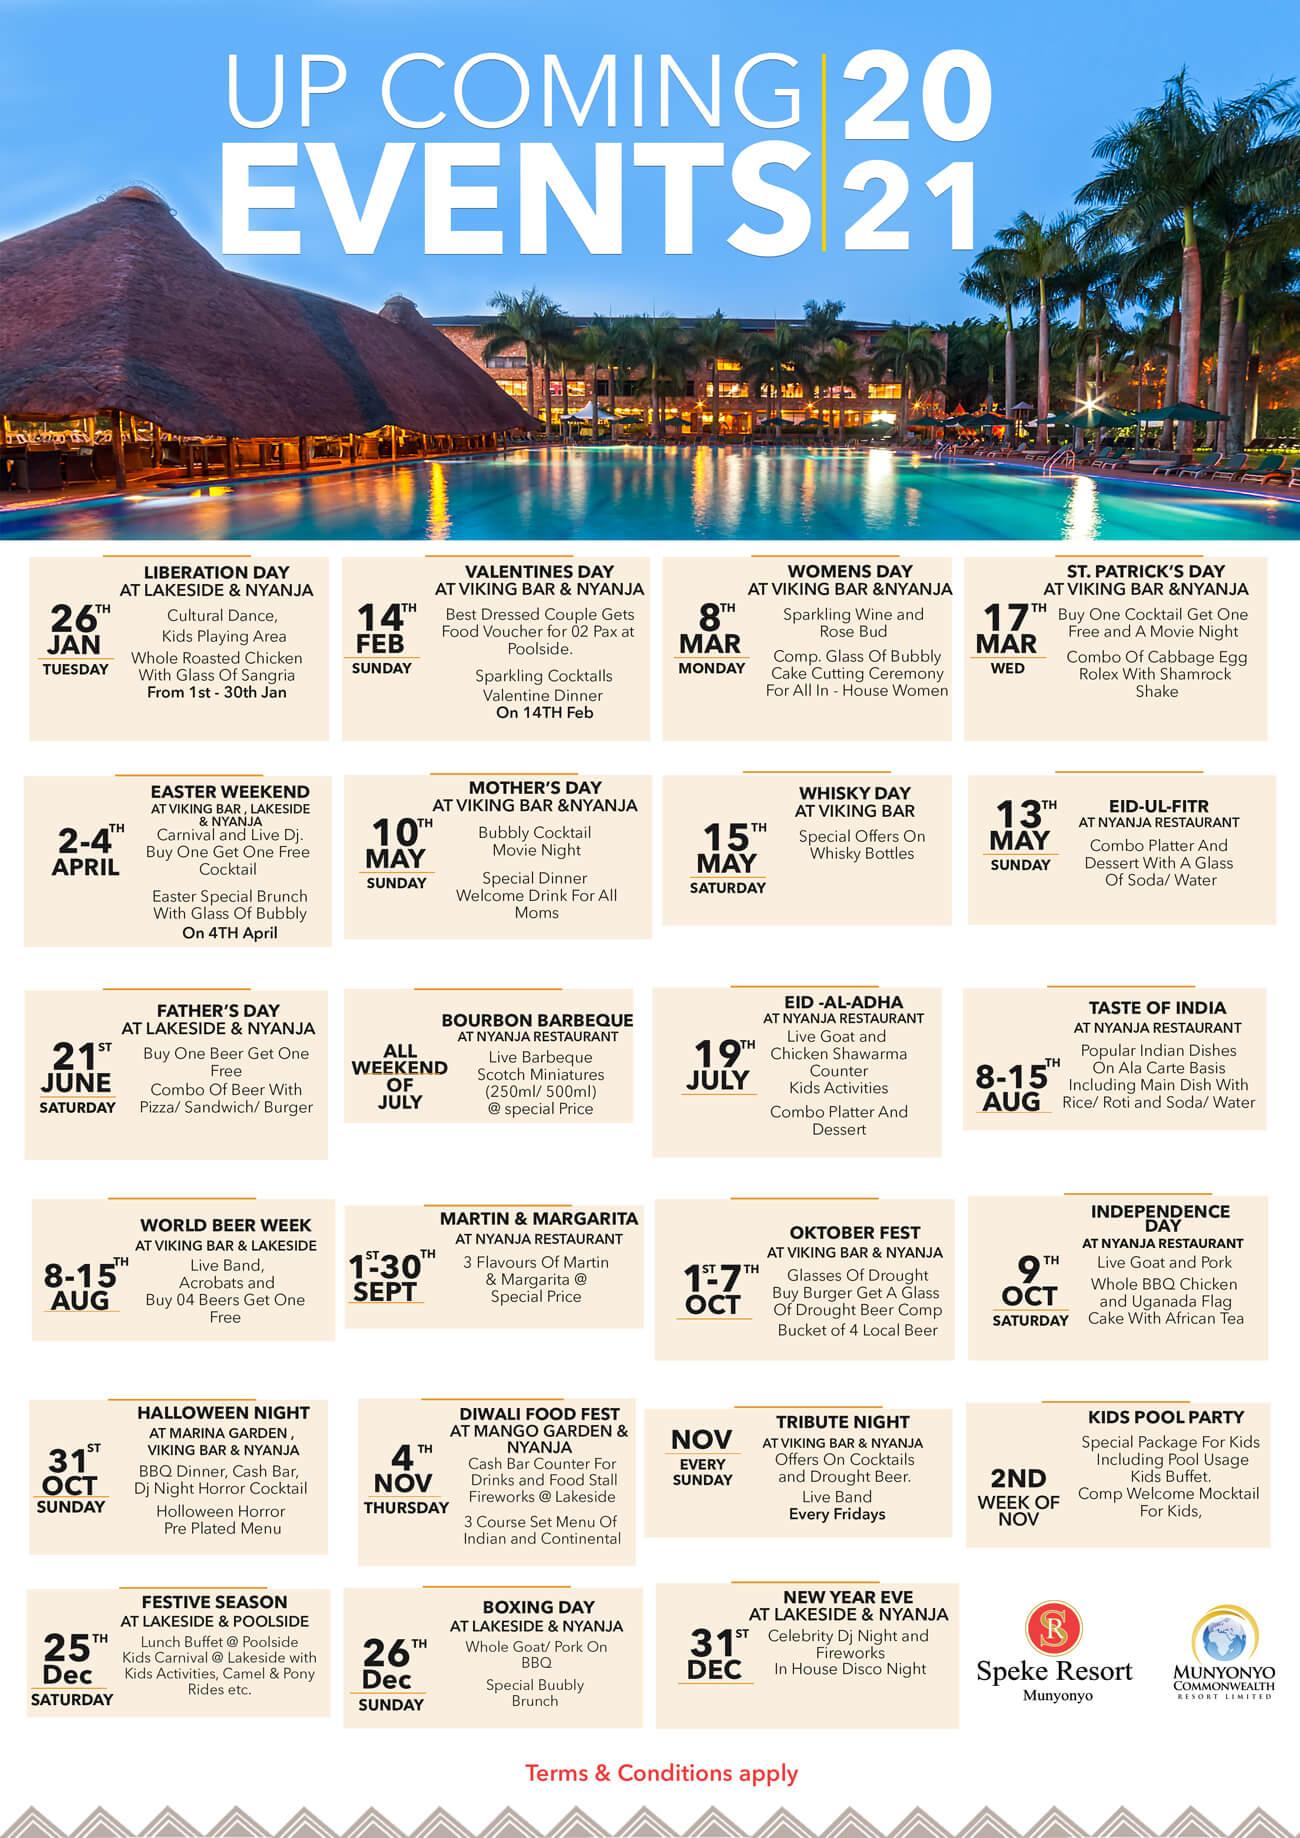 speke resort munyonyo events calendar